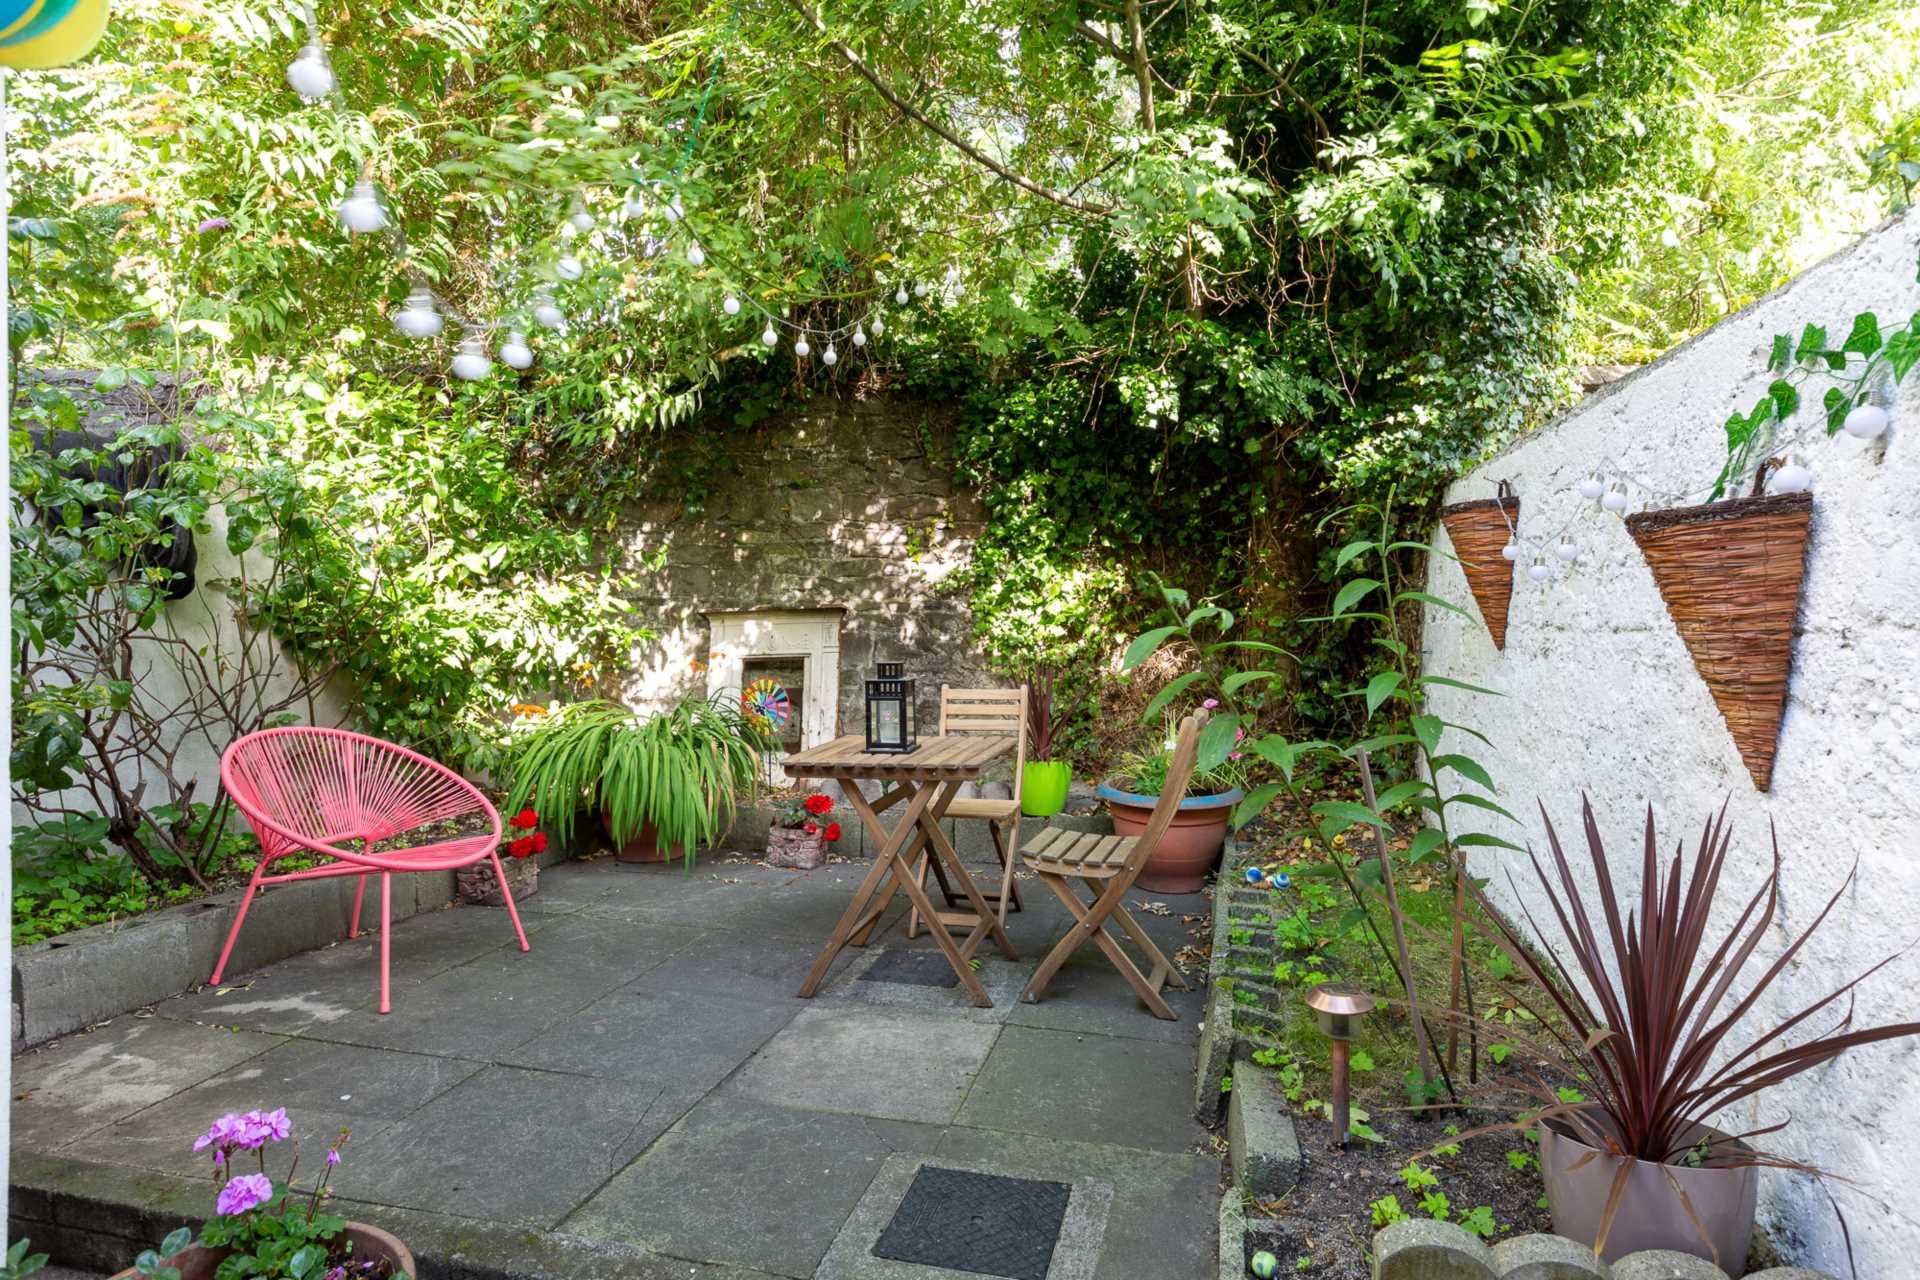 32 Thomas Court, Dublin  8, Image 14